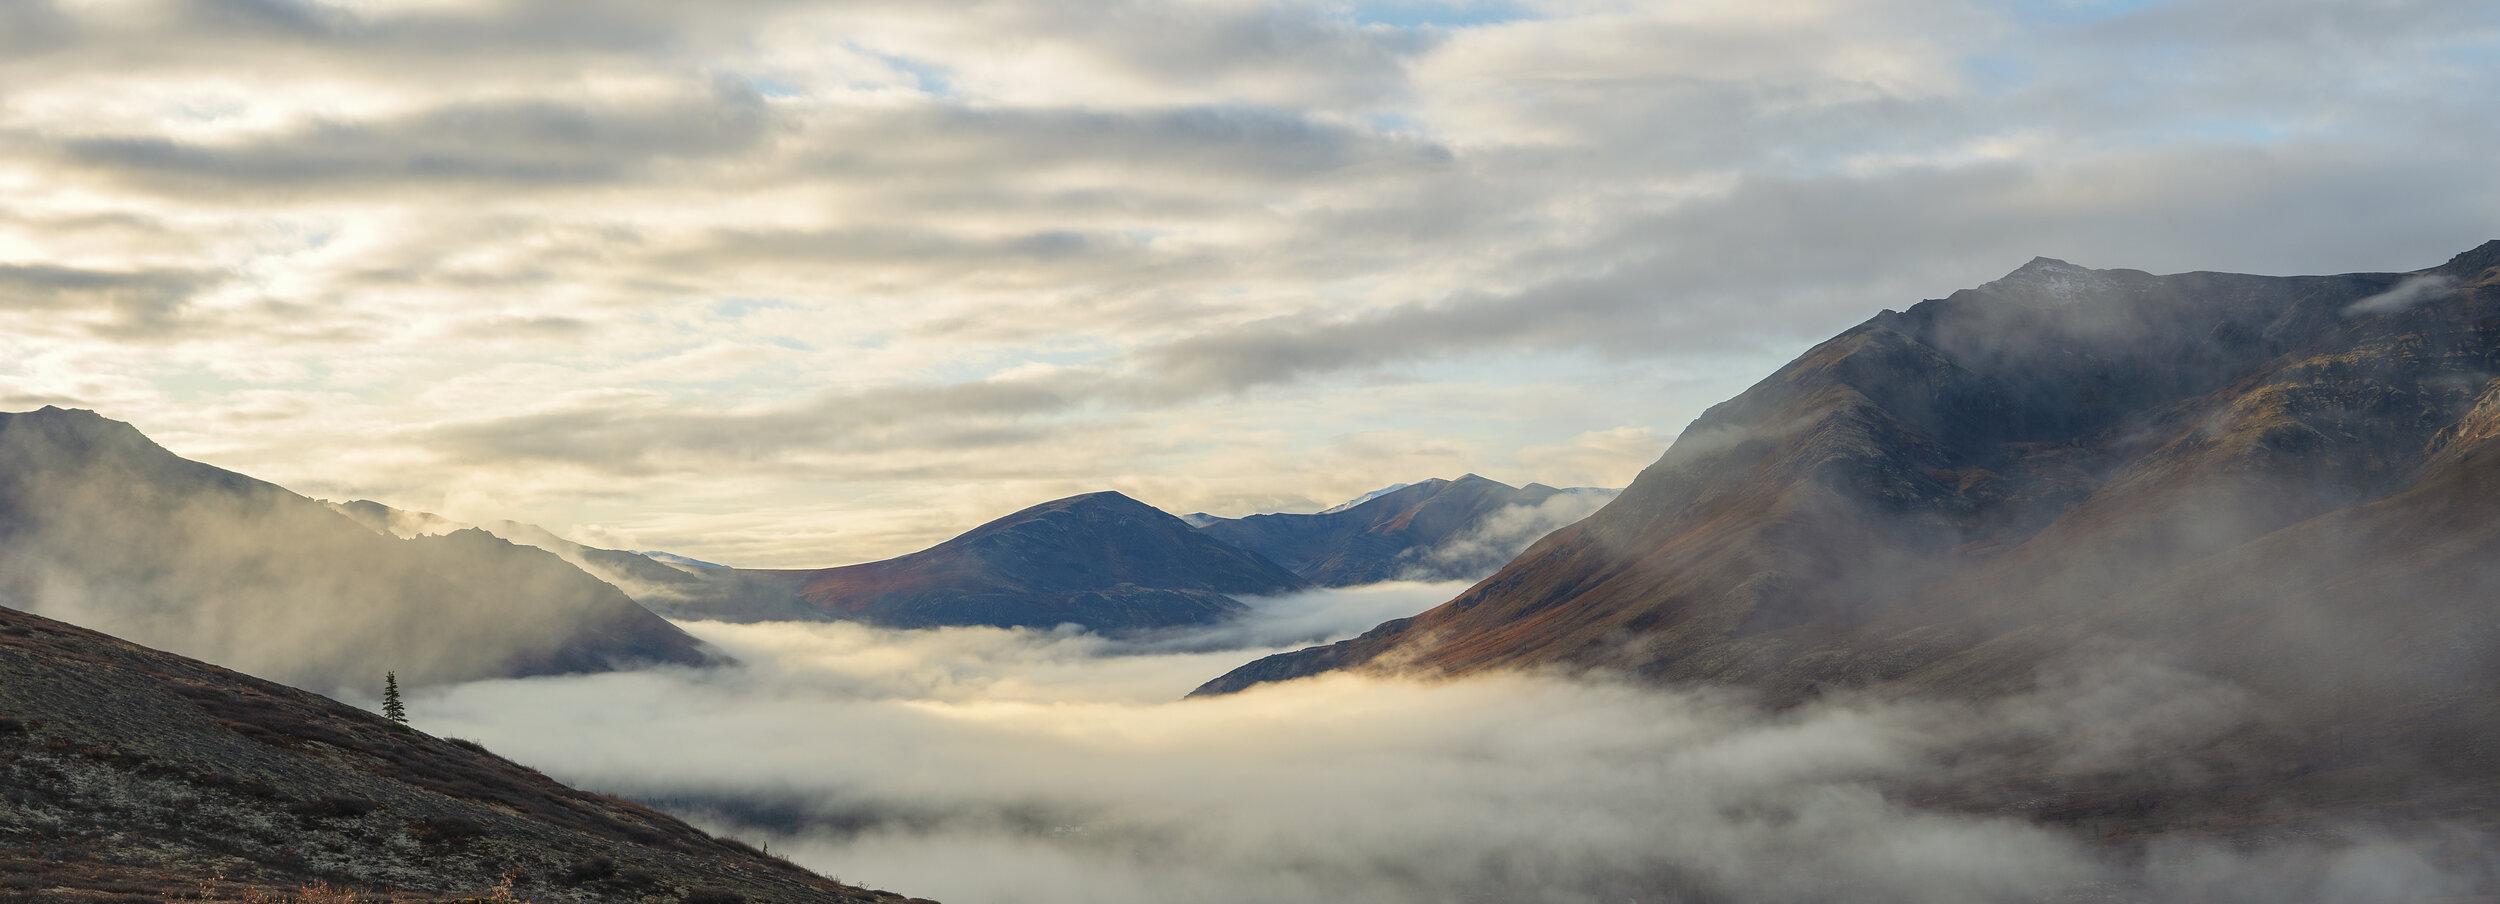 Foggy mornings in Yukon